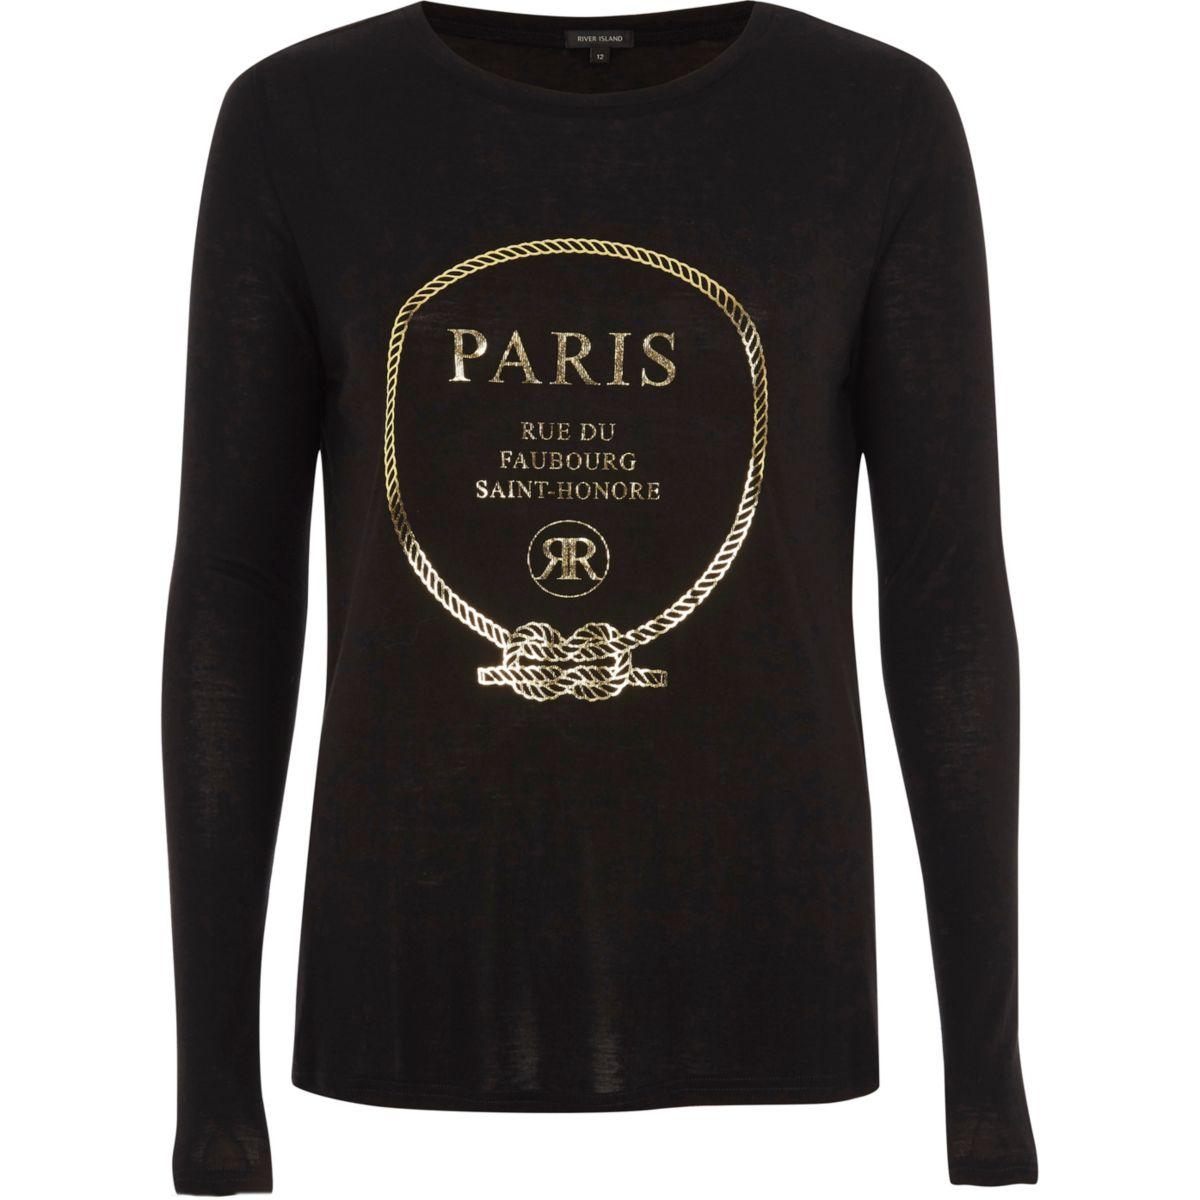 "Schwarzes, langärmliges T-Shirt ""Paris"""